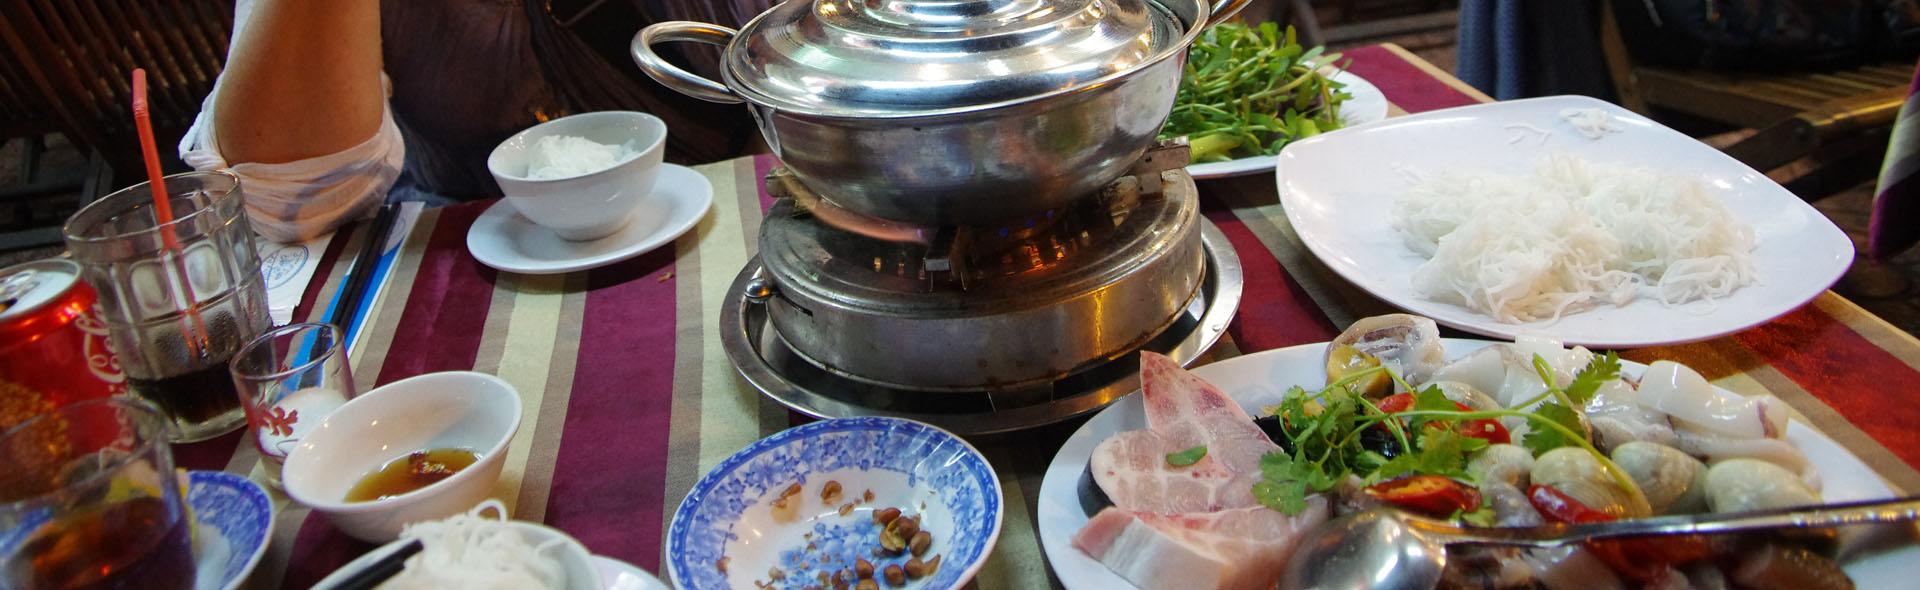 Saigon mit Kaffee und Feuertopf